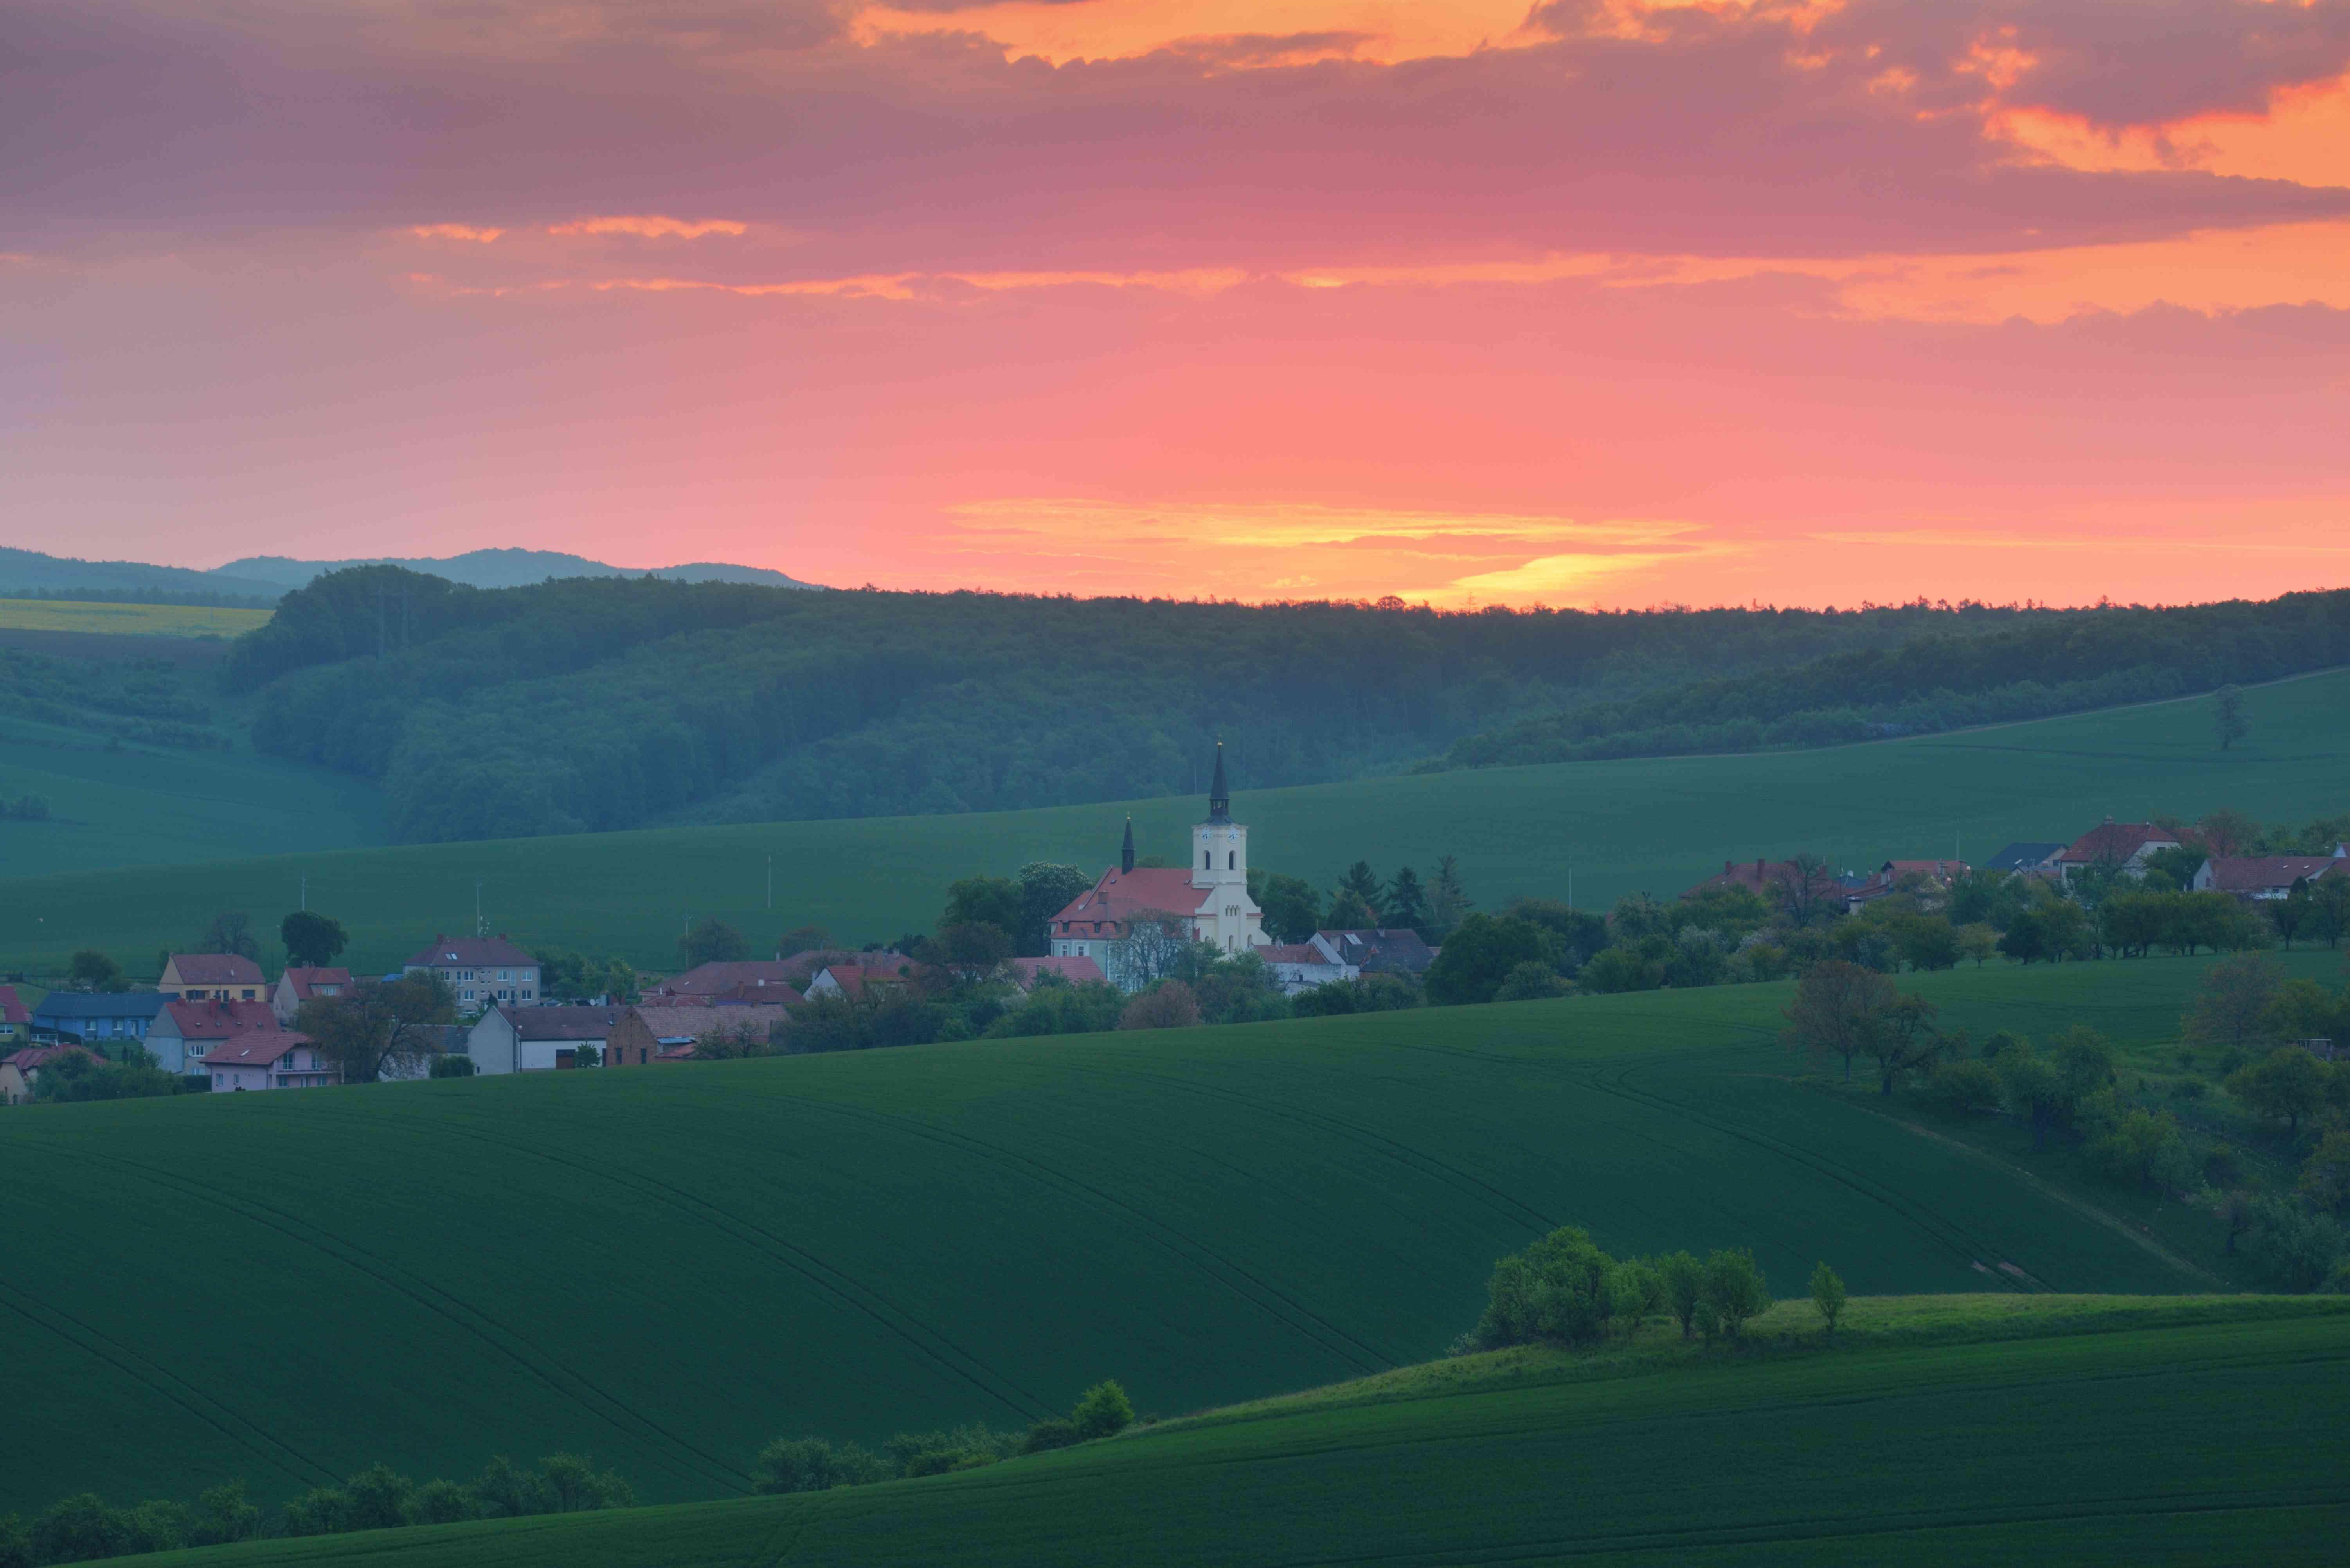 Rural landscape with a church at sunrise South Moravia, Czech Republic